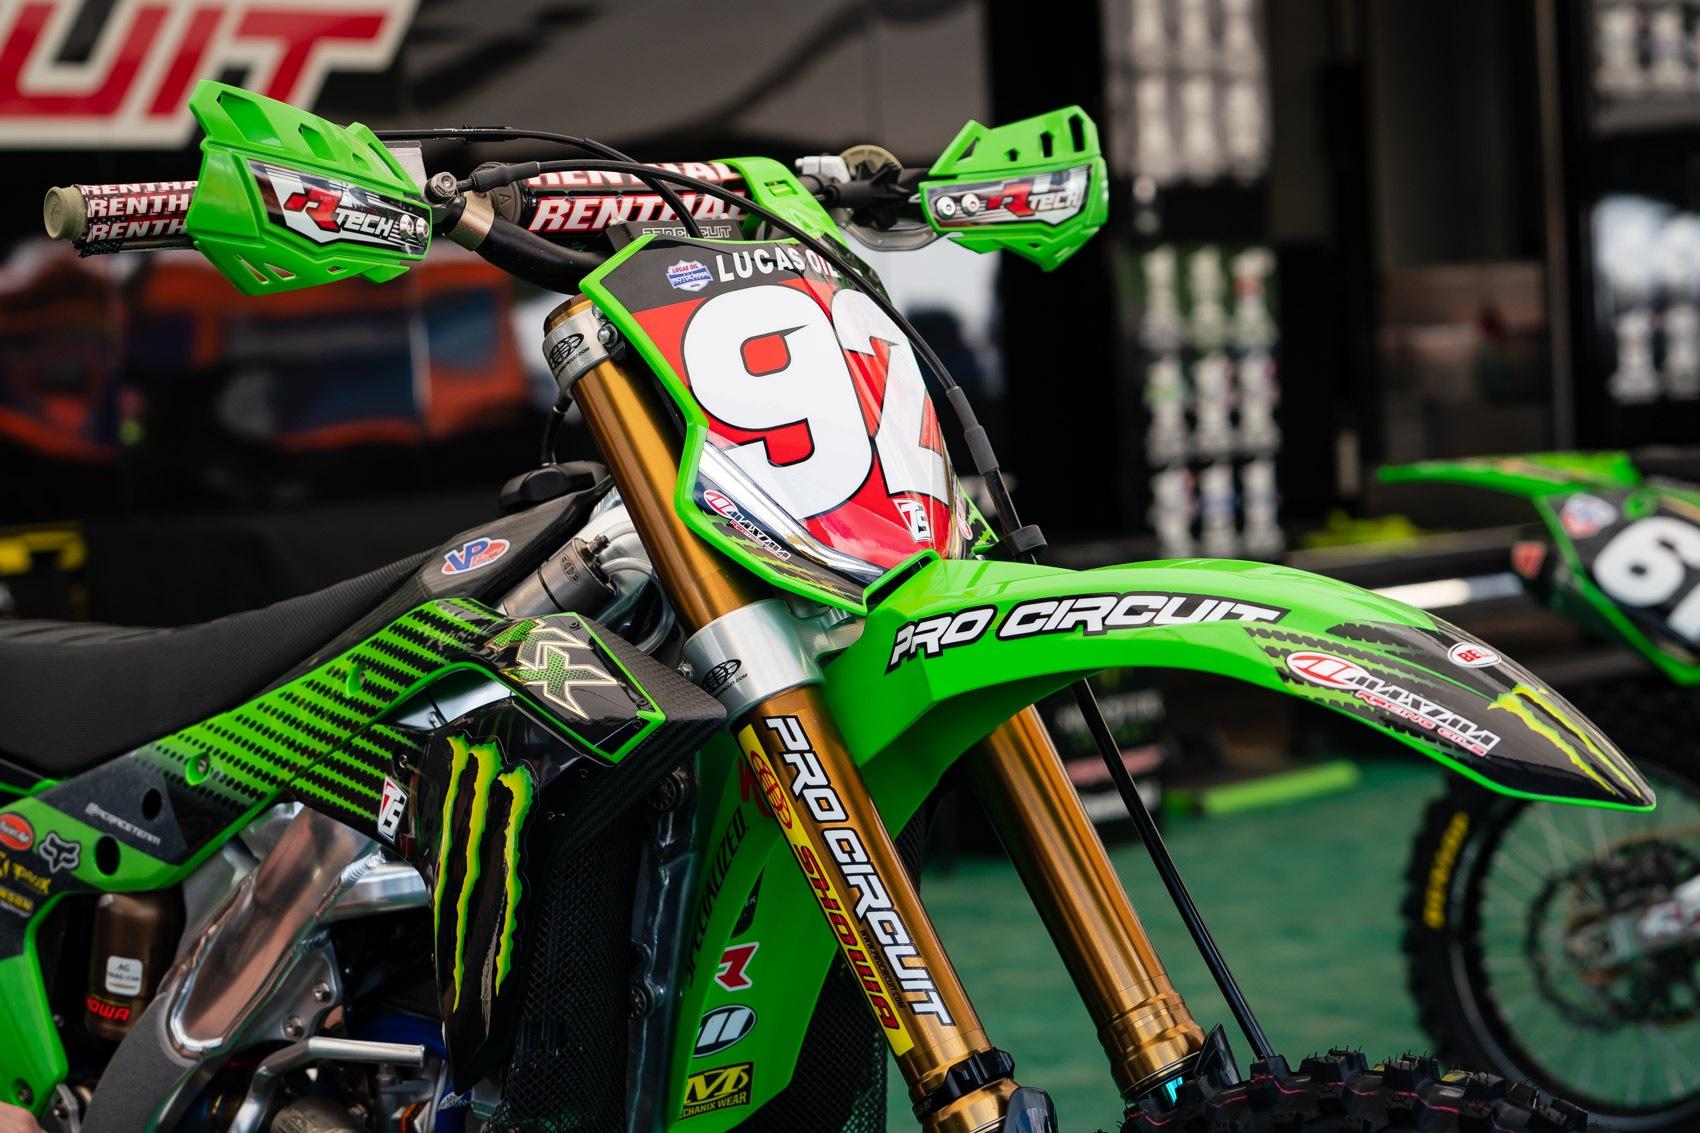 2019 High Point Motocross Kickstart Recap   Swapmoto Live